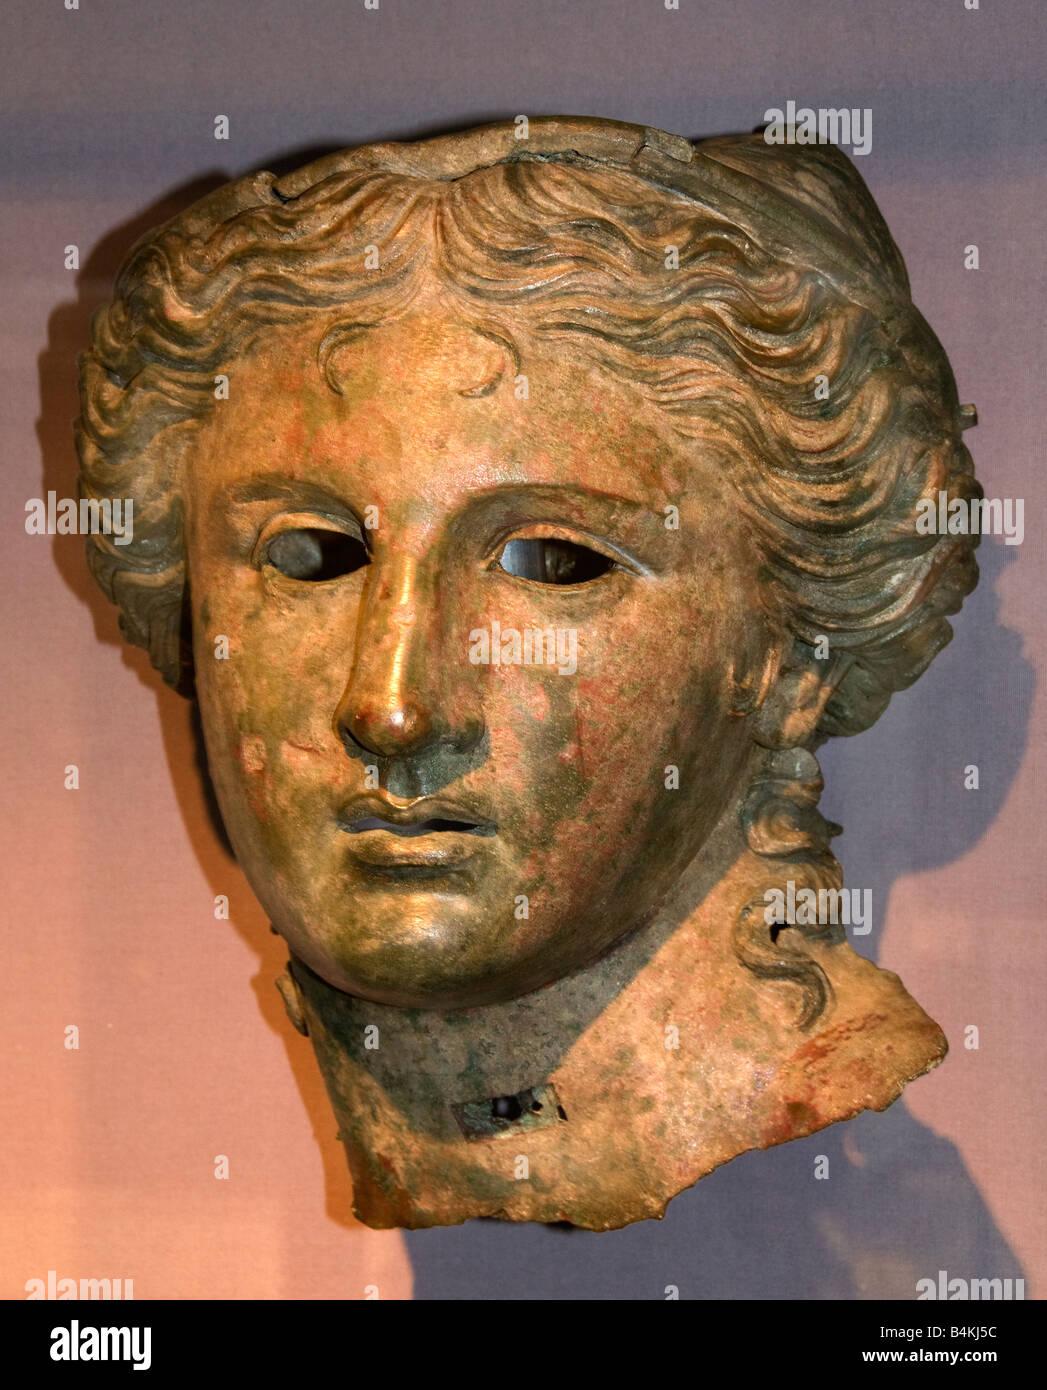 Anahita shown in the guise of Aphrodite 200 100 BC Satala North East Asia Minor Armenia - Stock Image